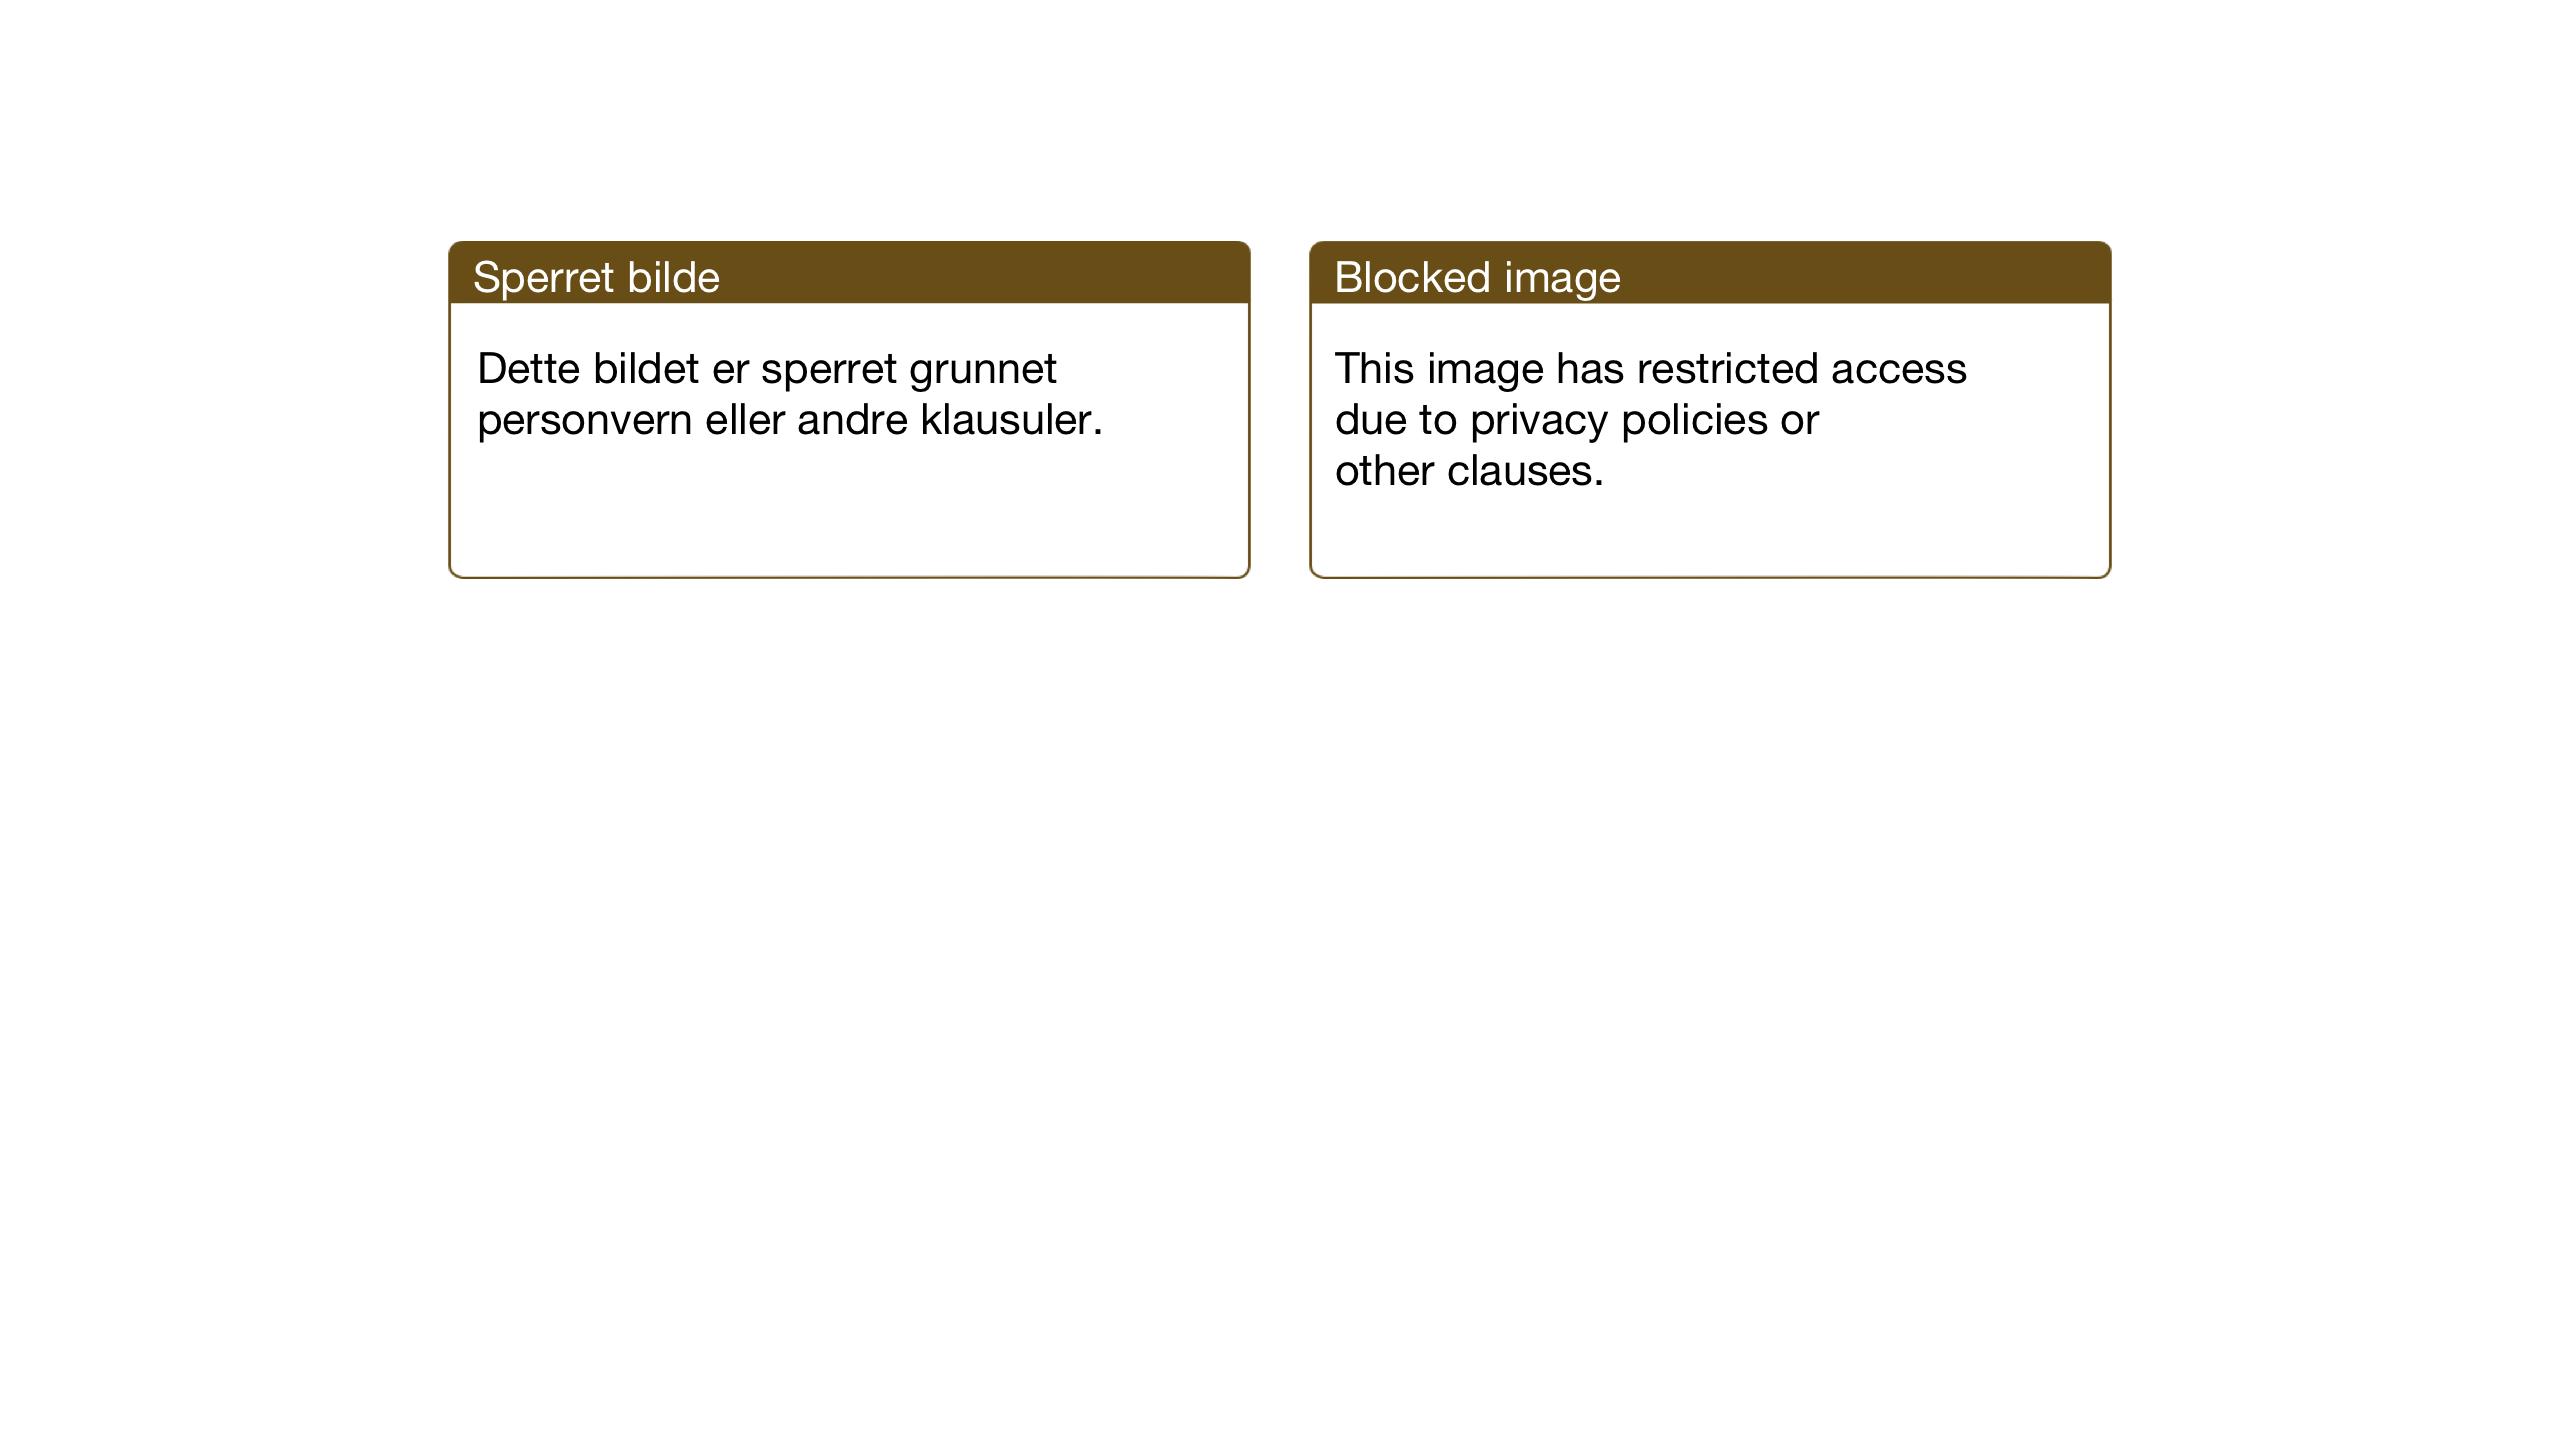 SAT, Ministerialprotokoller, klokkerbøker og fødselsregistre - Nordland, 843/L0640: Klokkerbok nr. 843C09, 1925-1941, s. 63